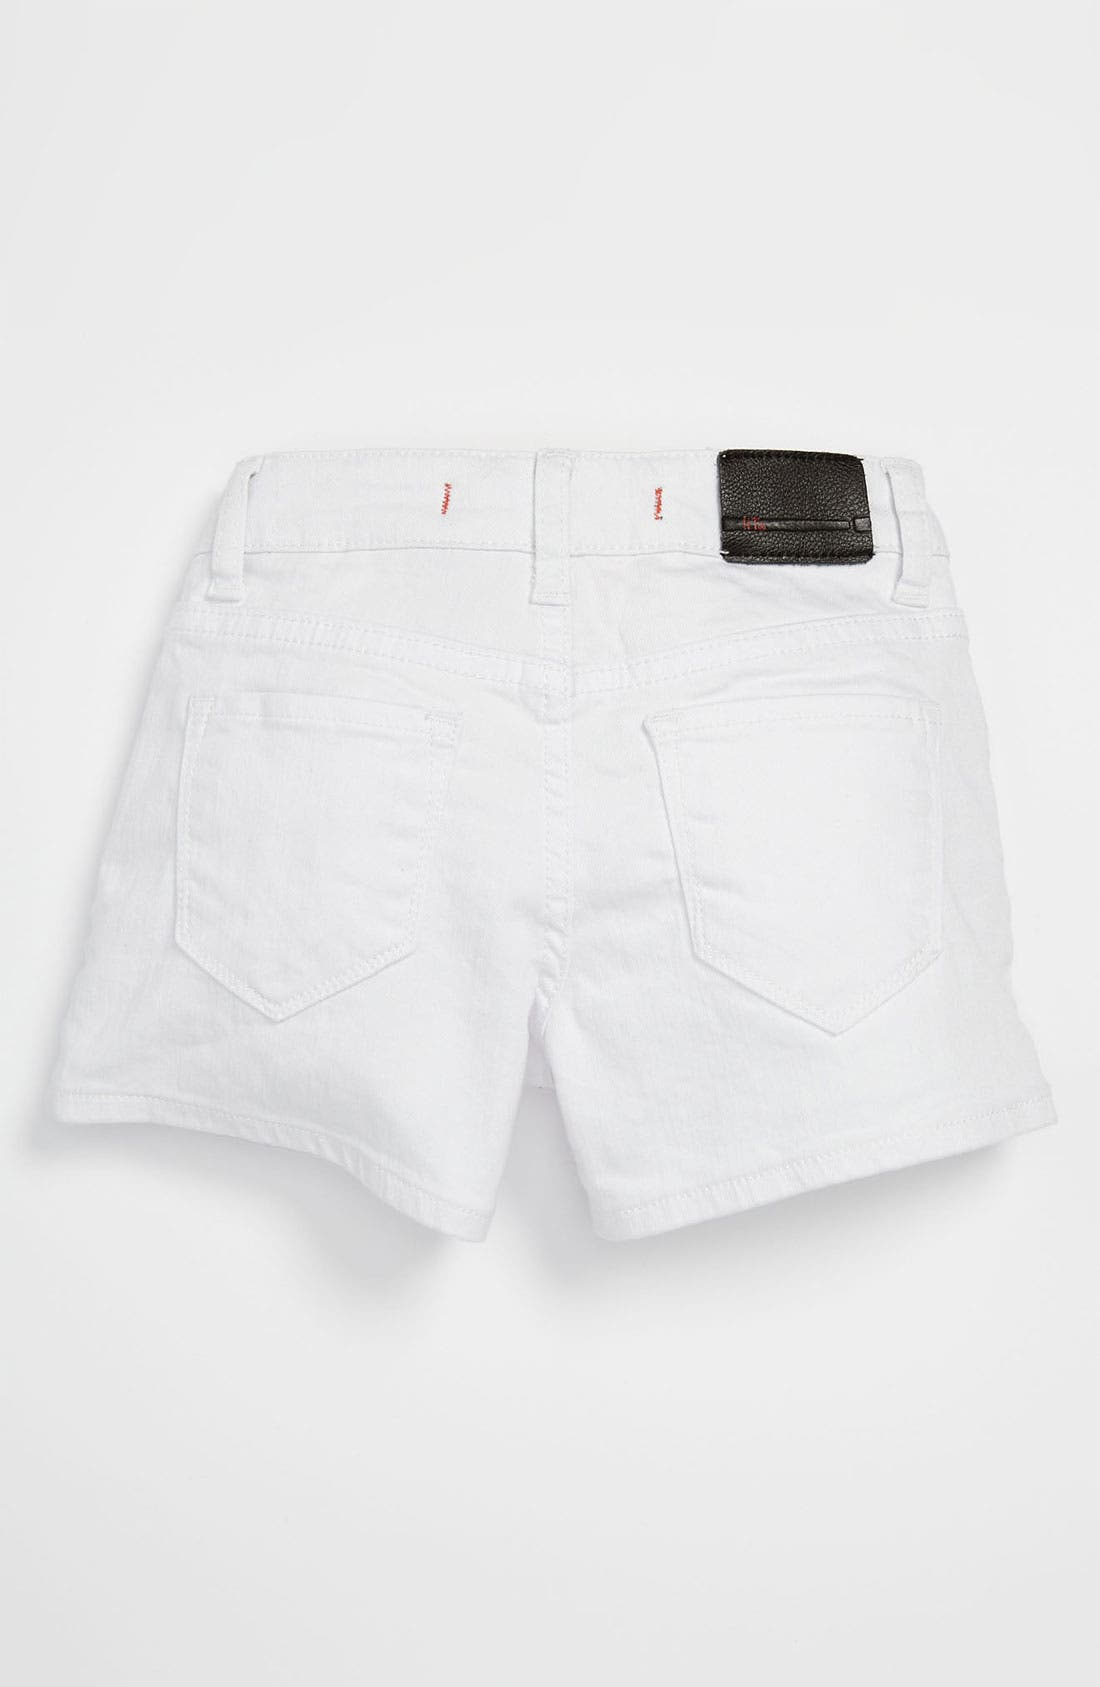 Main Image - !iT JEANS Denim Shorts (Big Girls)